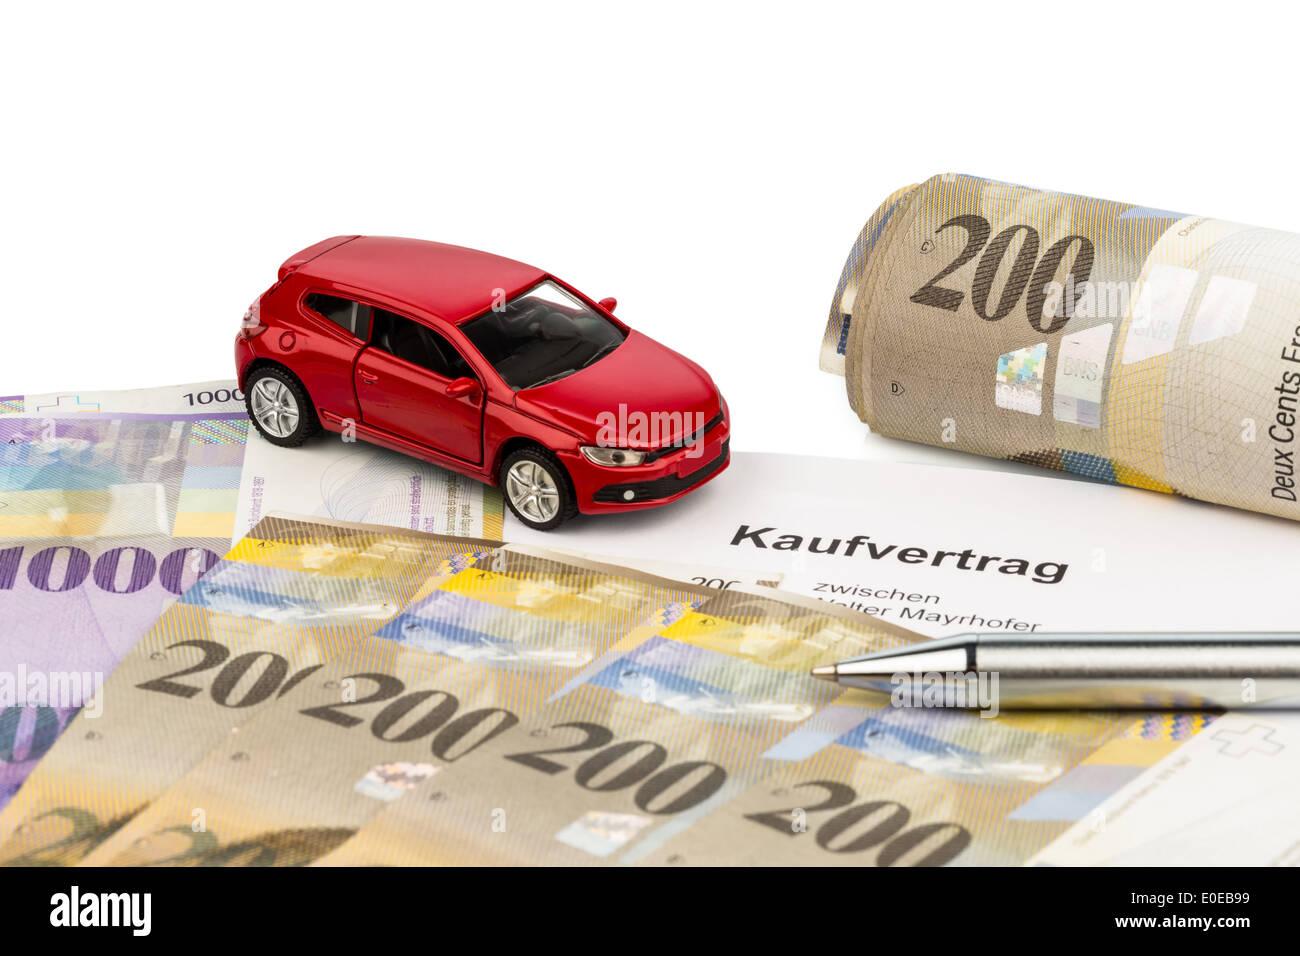 Auto Kaufvertrag Stock Photos & Auto Kaufvertrag Stock Images - Alamy